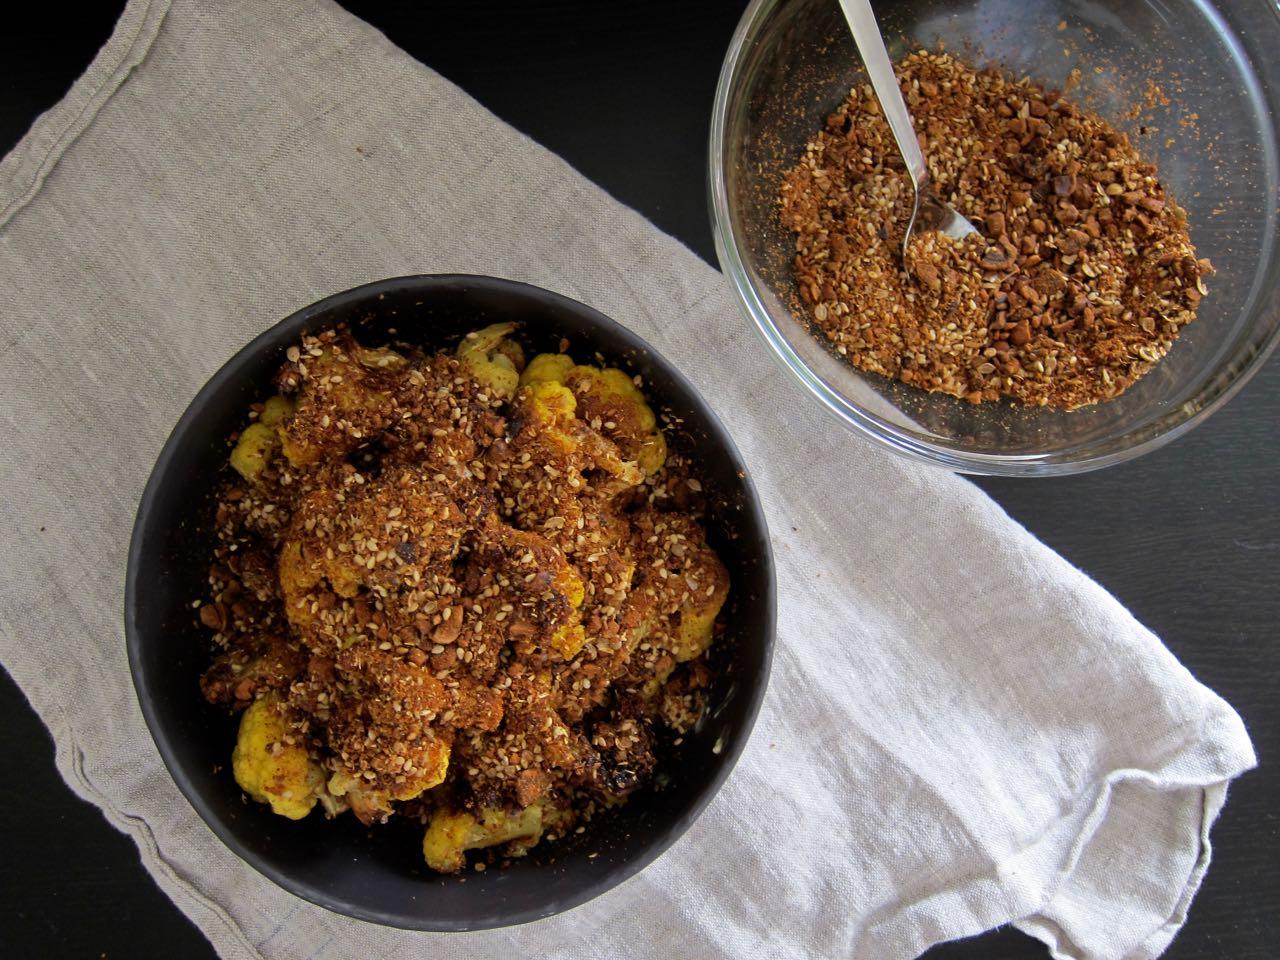 Topping Cauliflower with Dukkah